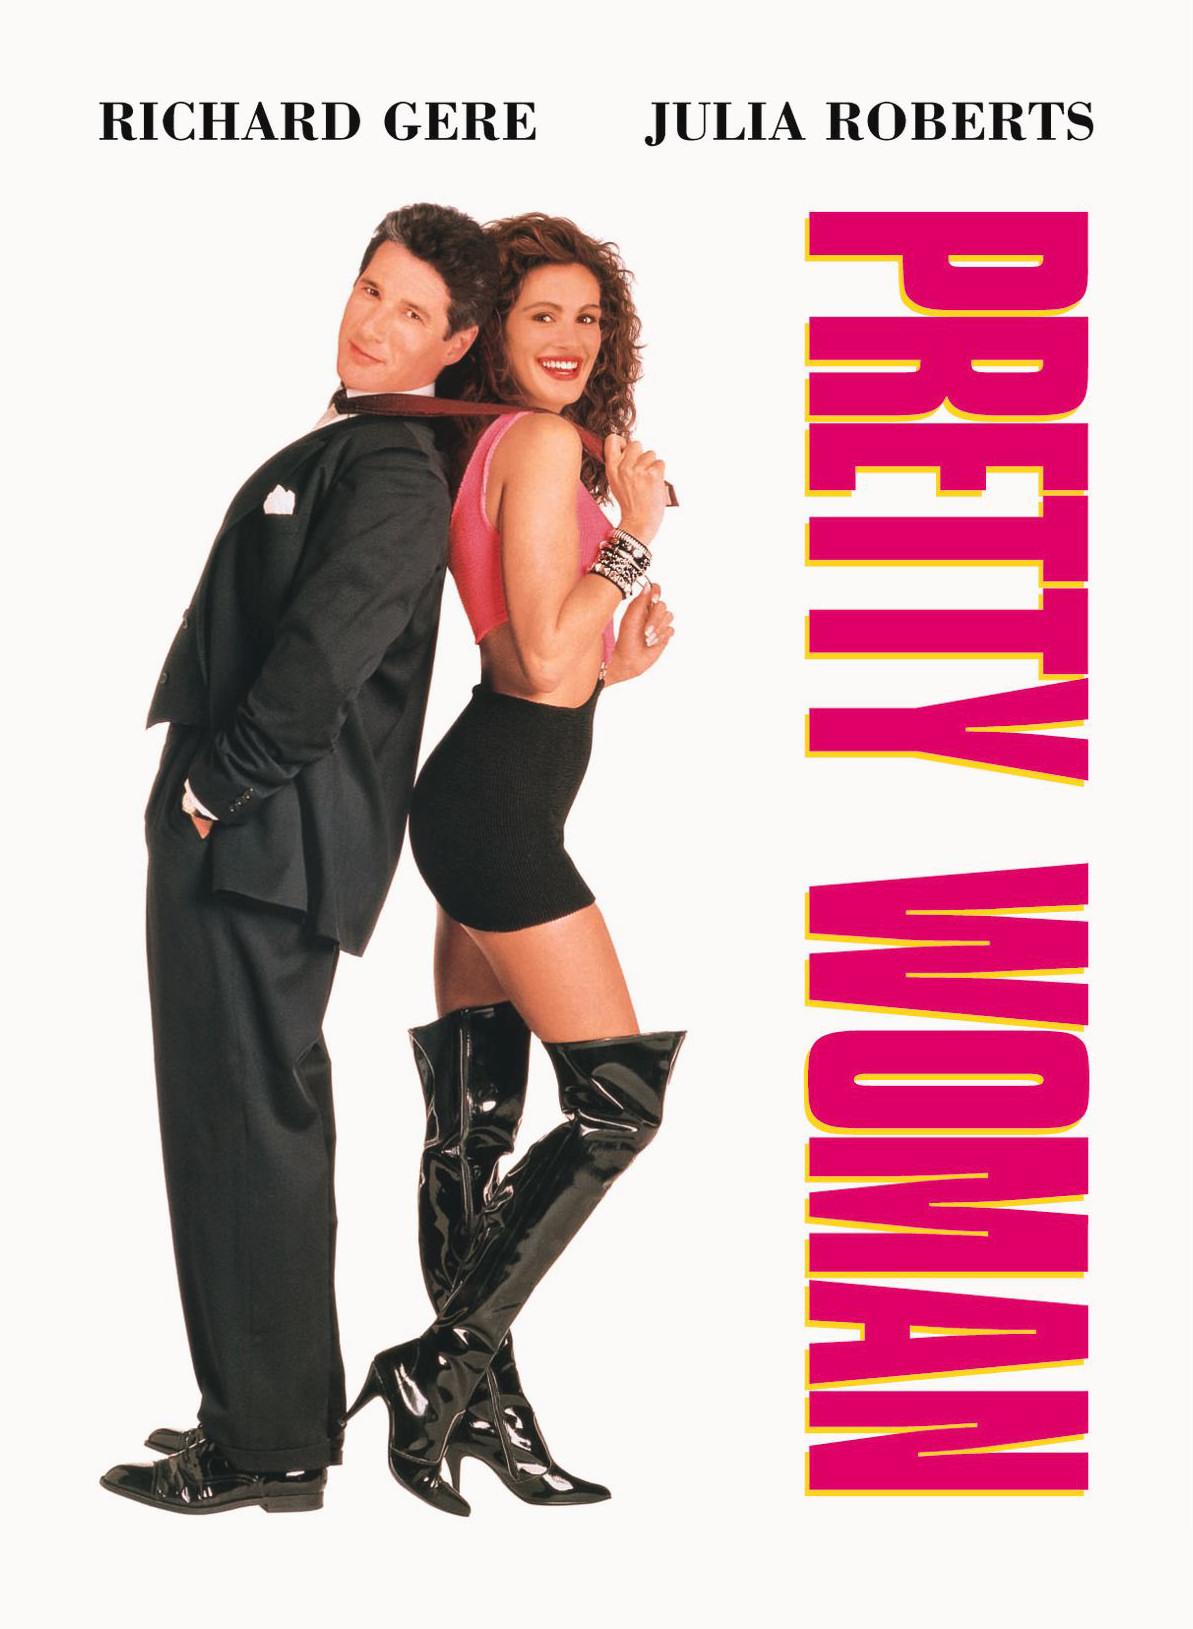 Pretty woman (1990) de Garry Marshall